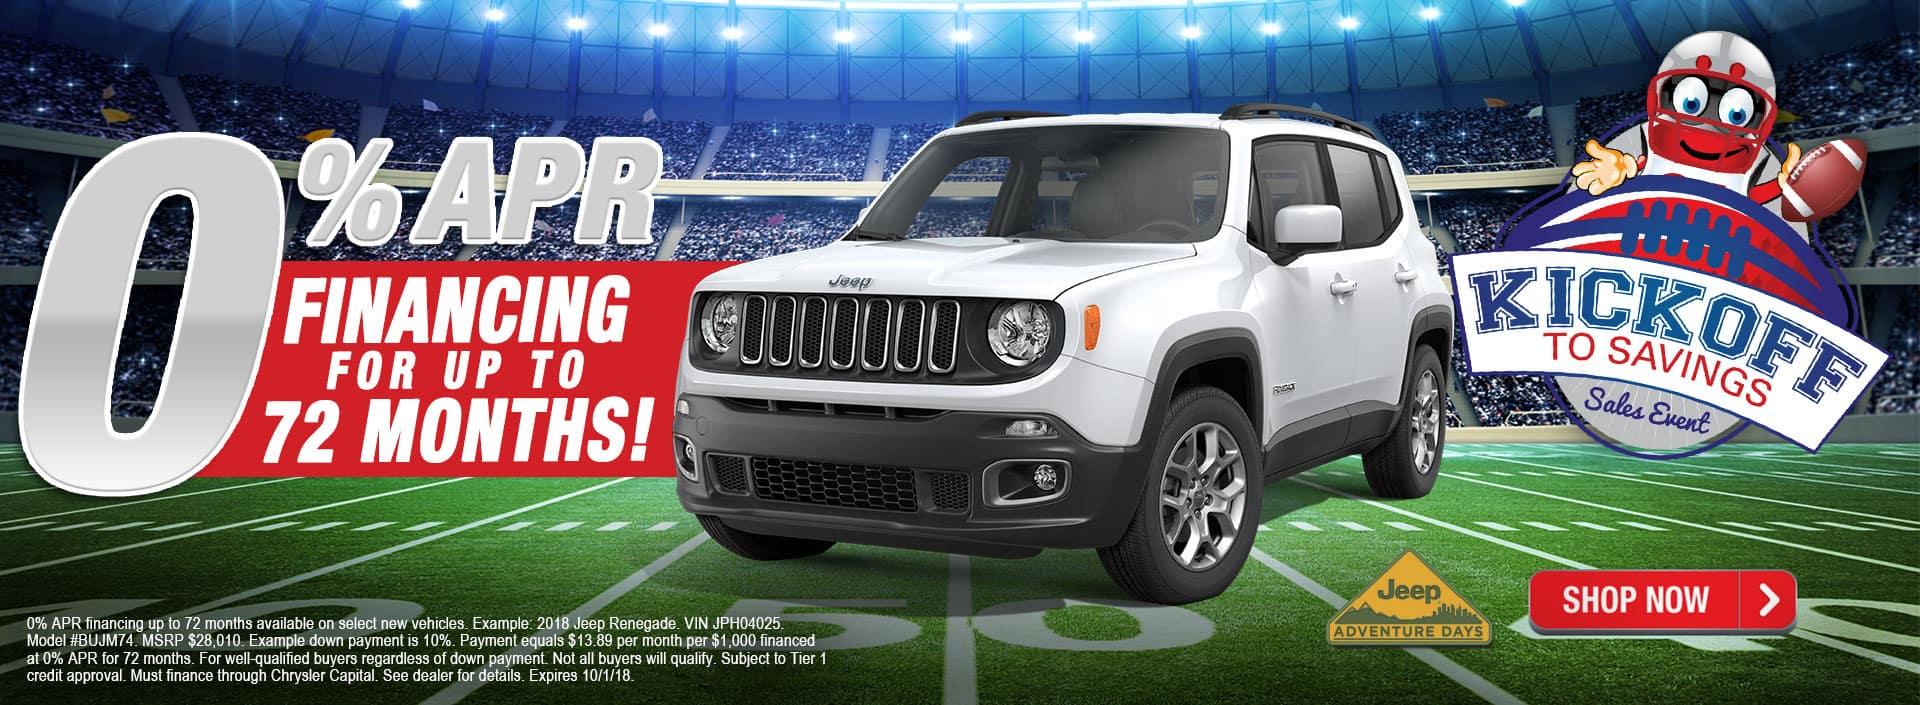 Chrysler jeep dodge dealer brockton ma cjdr 24 testimonials fandeluxe Gallery